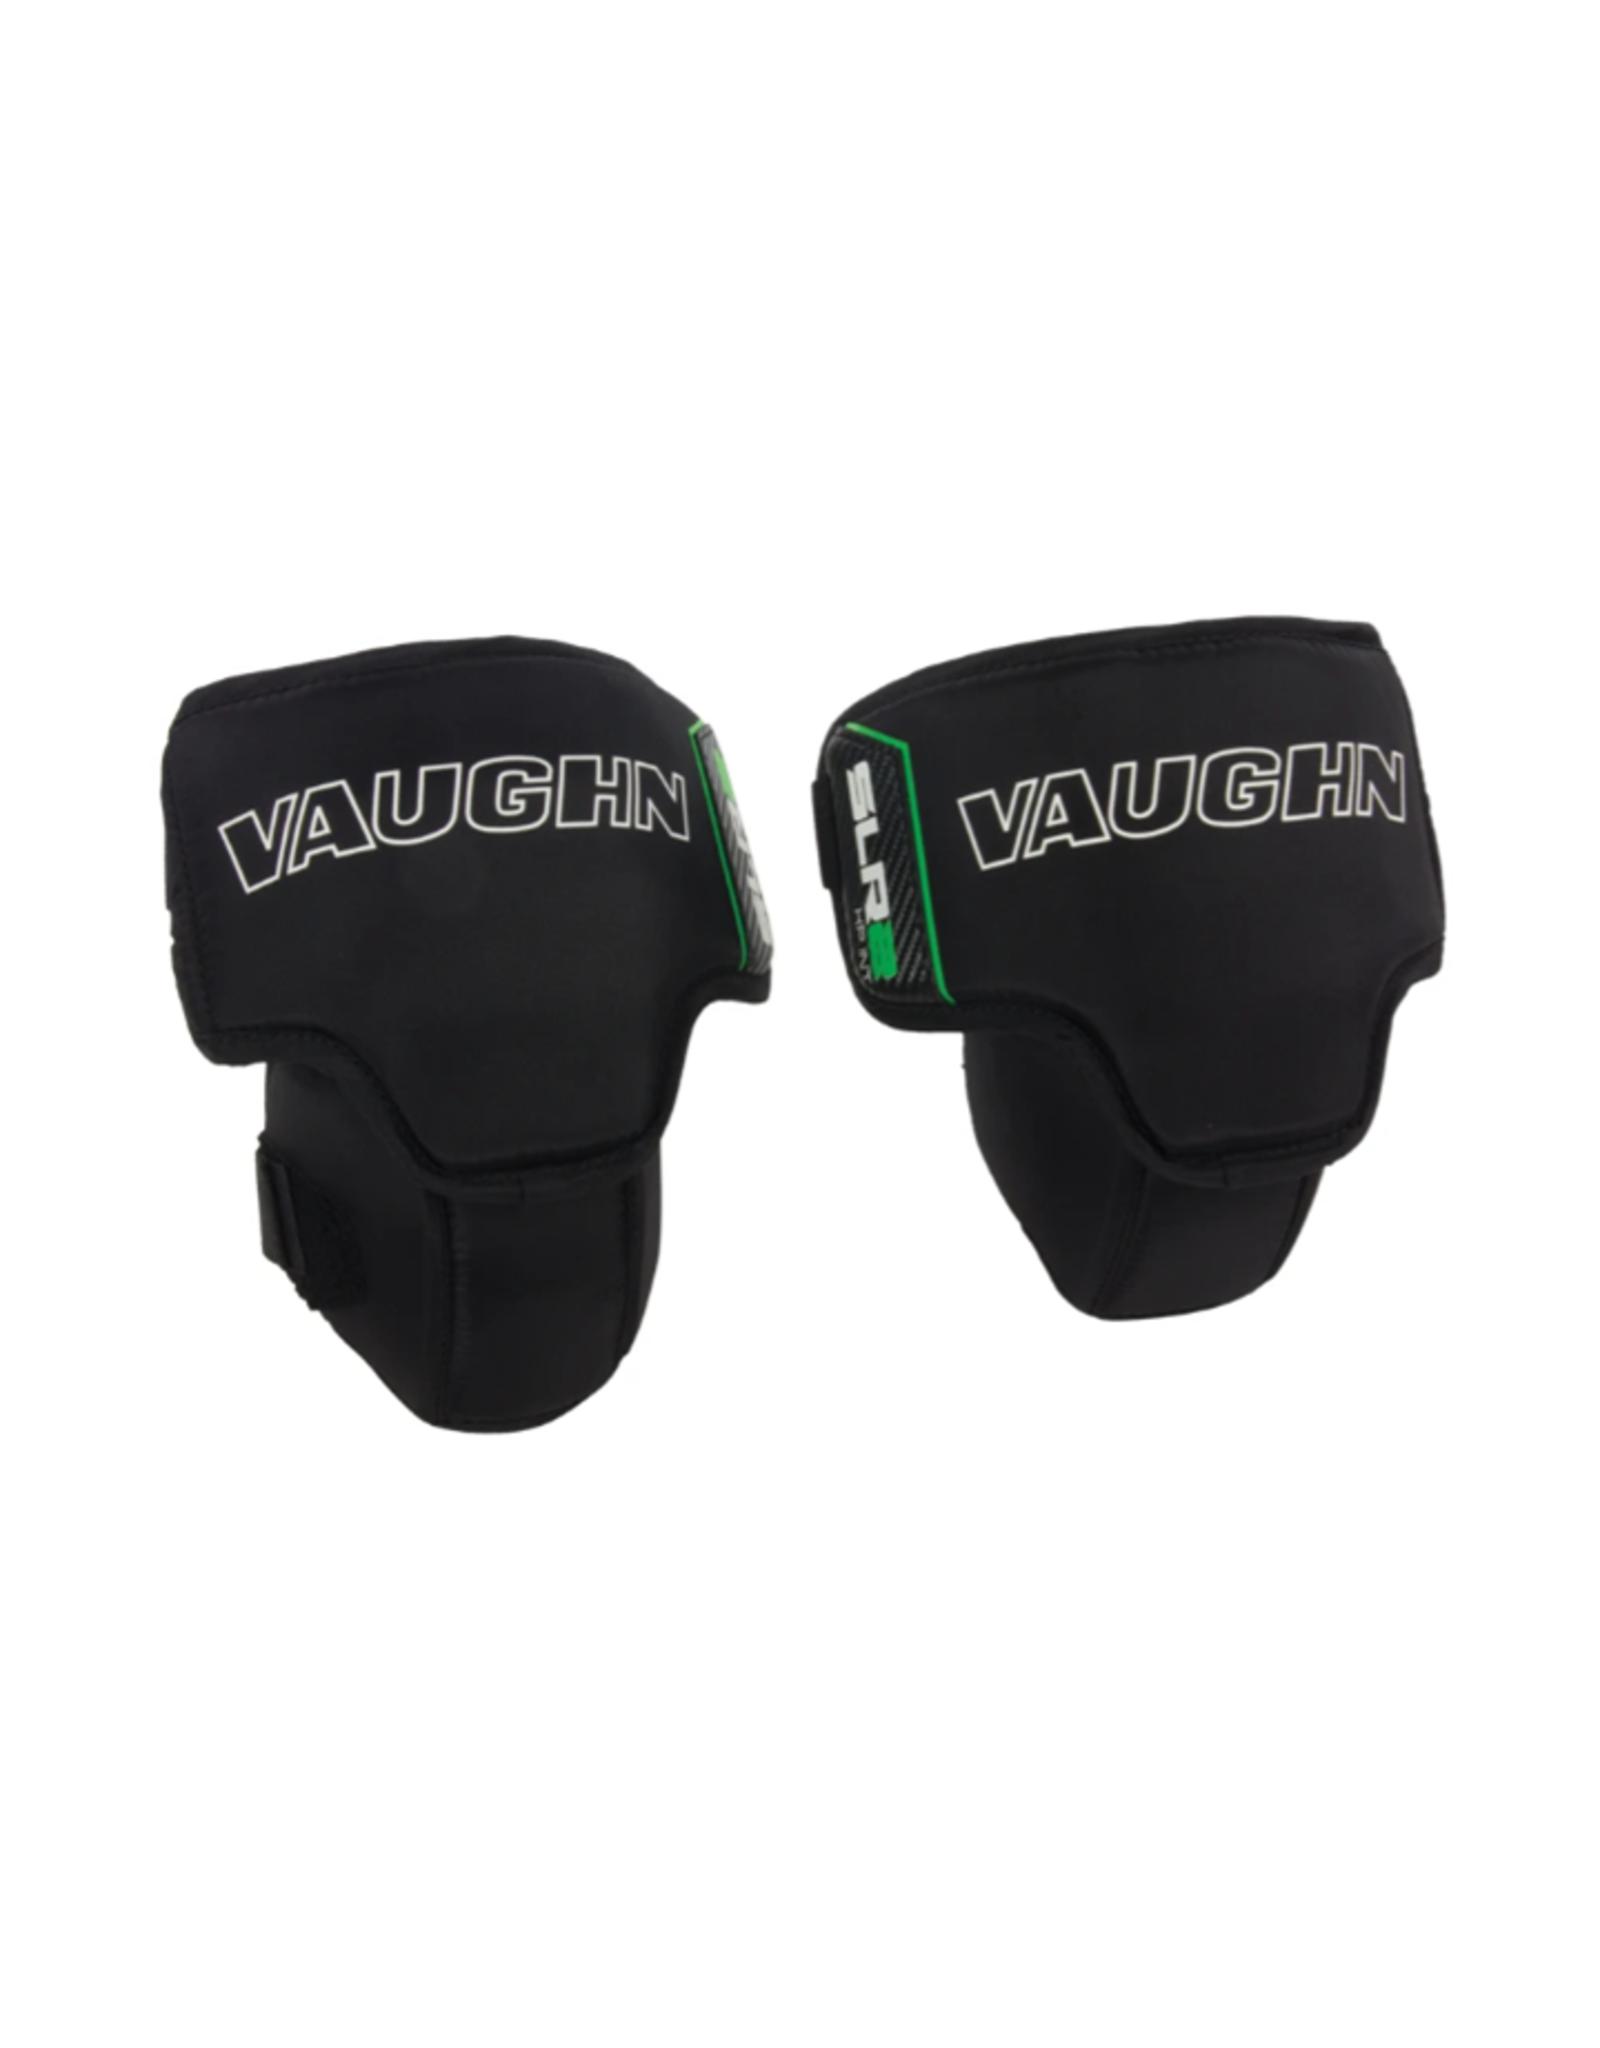 Vaughn SLR2 Goalie Knee Pads Junior